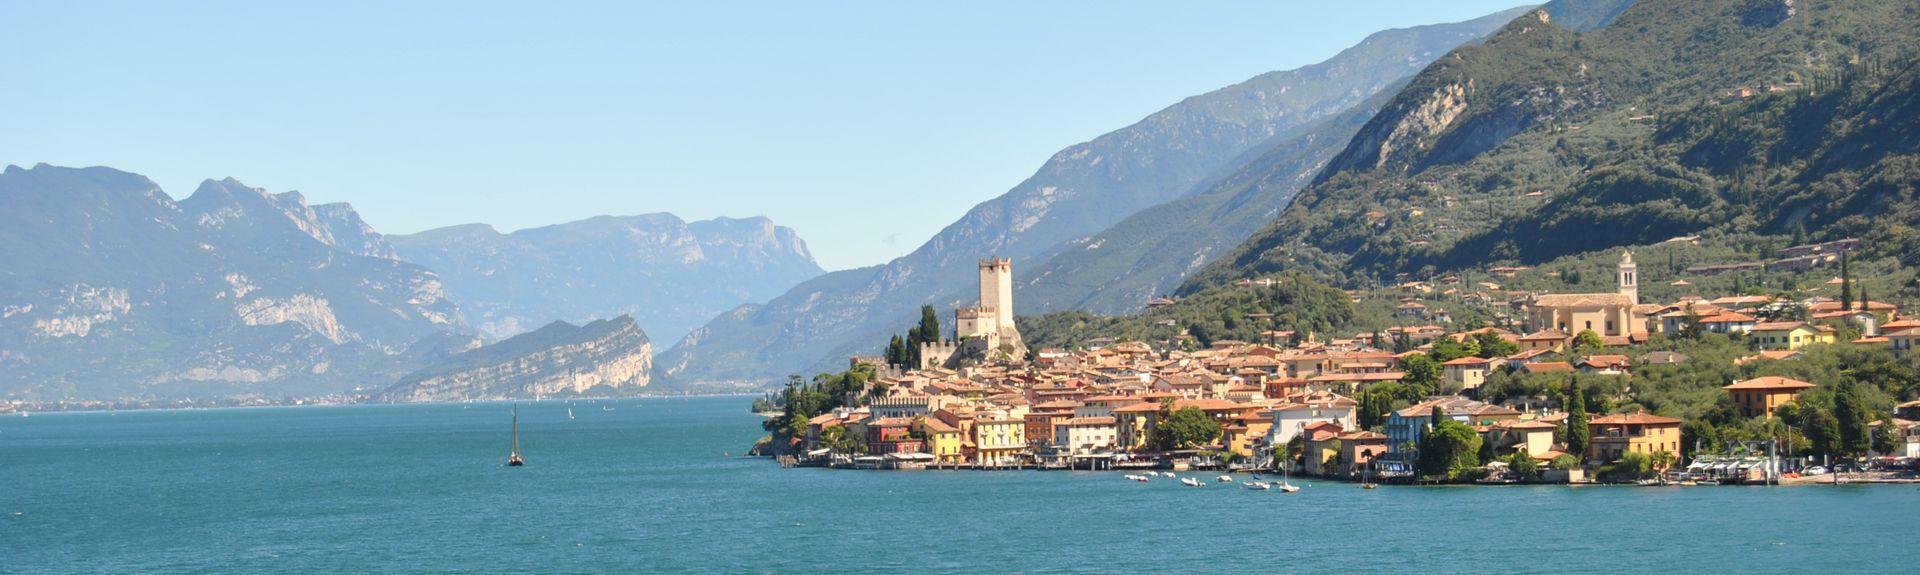 Gardola, Lombardiet, Italien